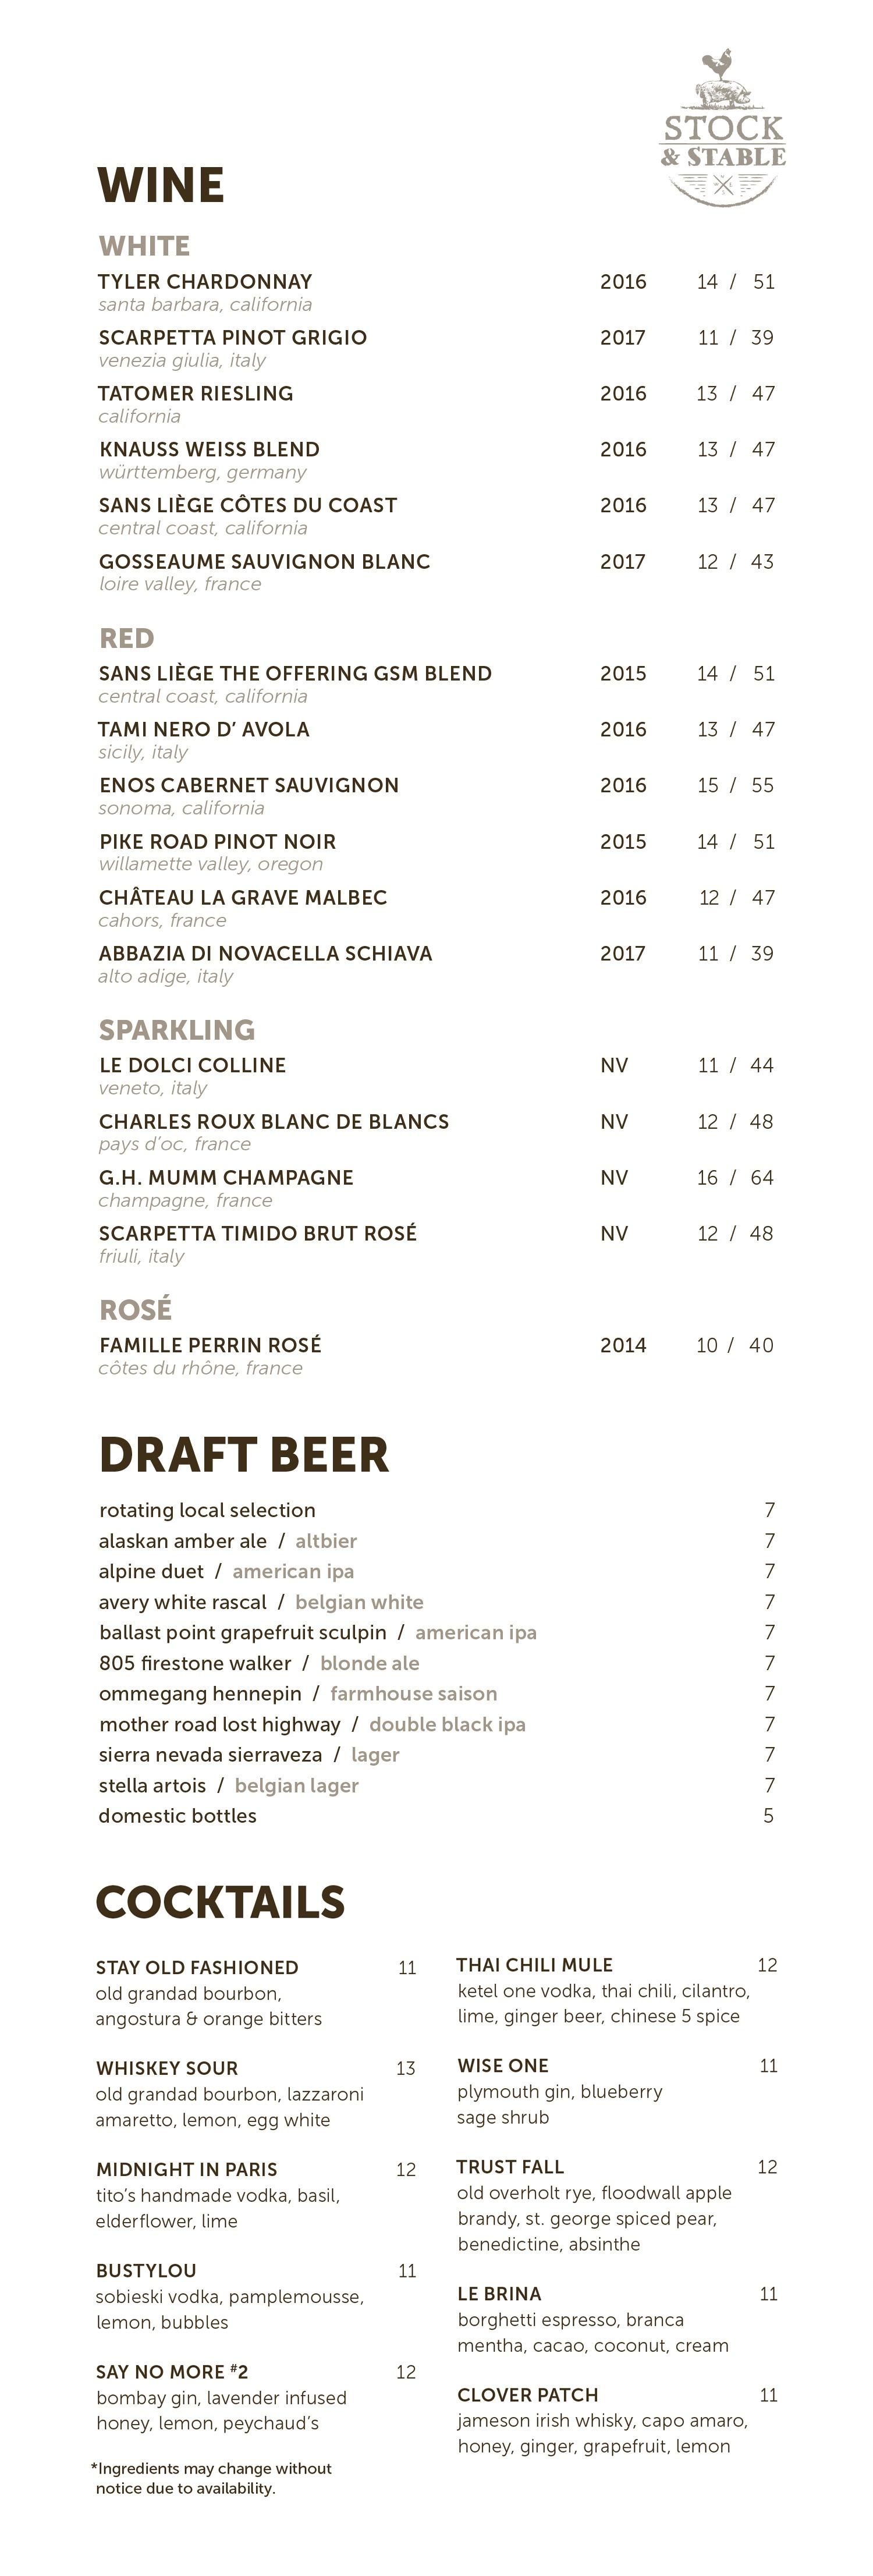 11.4.19 5x11 S+S drinks